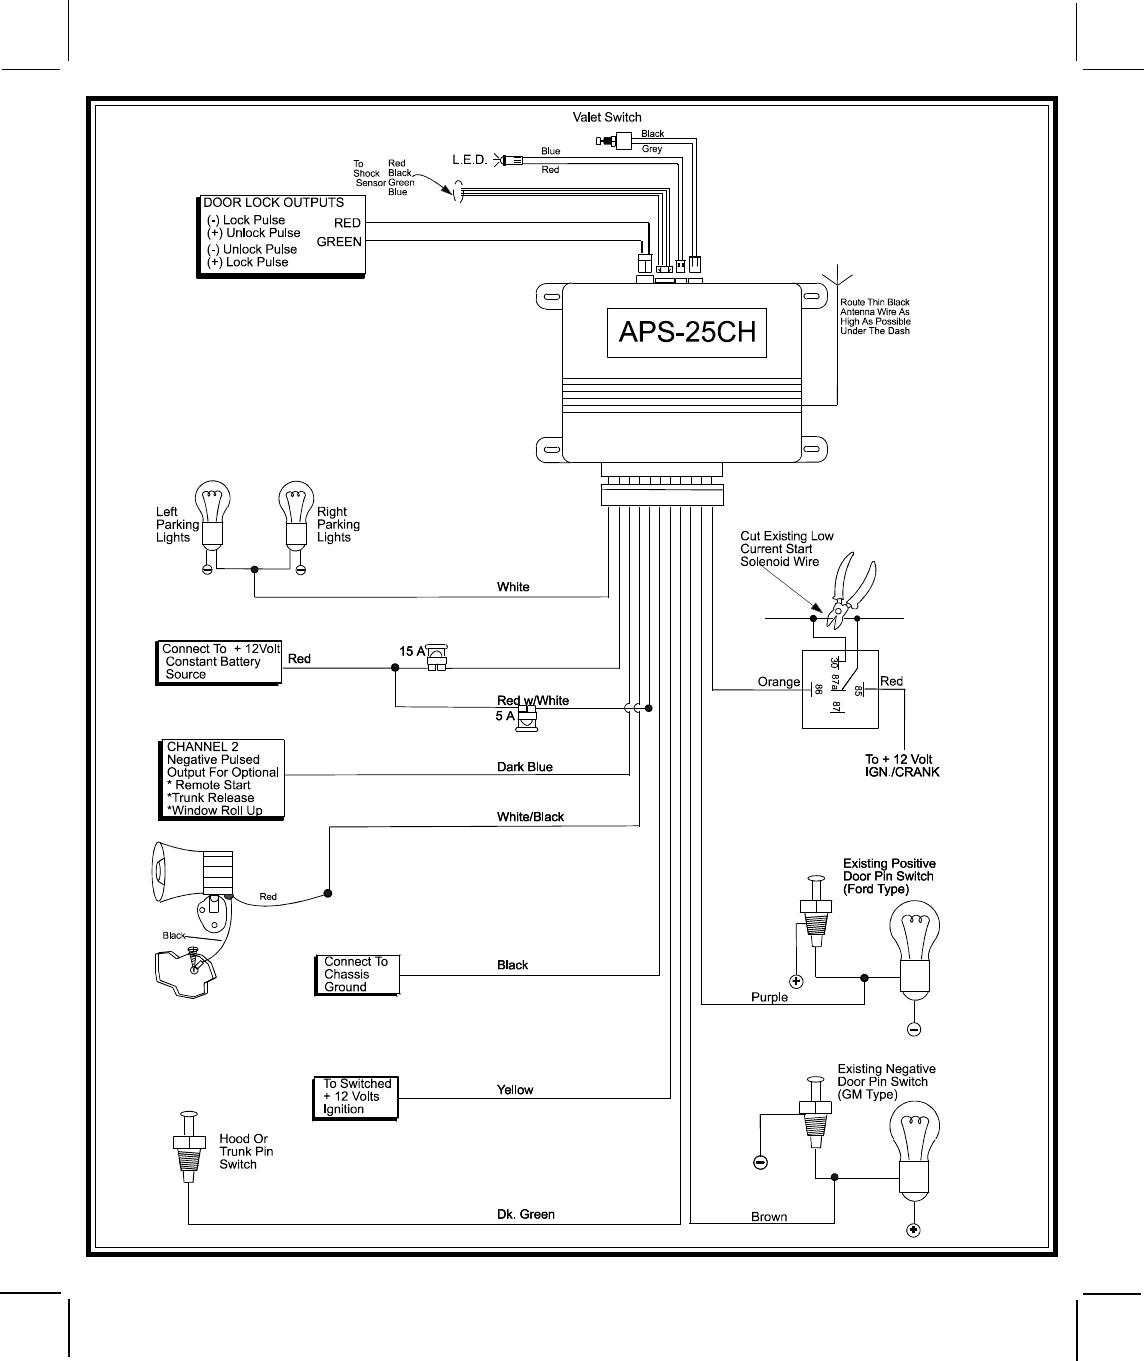 BZ_9805] Switch Wiring Diagram Together With Security Car Alarm Circuit  Diagram Download DiagramOupli Weasi Hila Reda Ixtu Onica Dext Cajos Kicep Zidur Opein  Mohammedshrine Librar Wiring 101